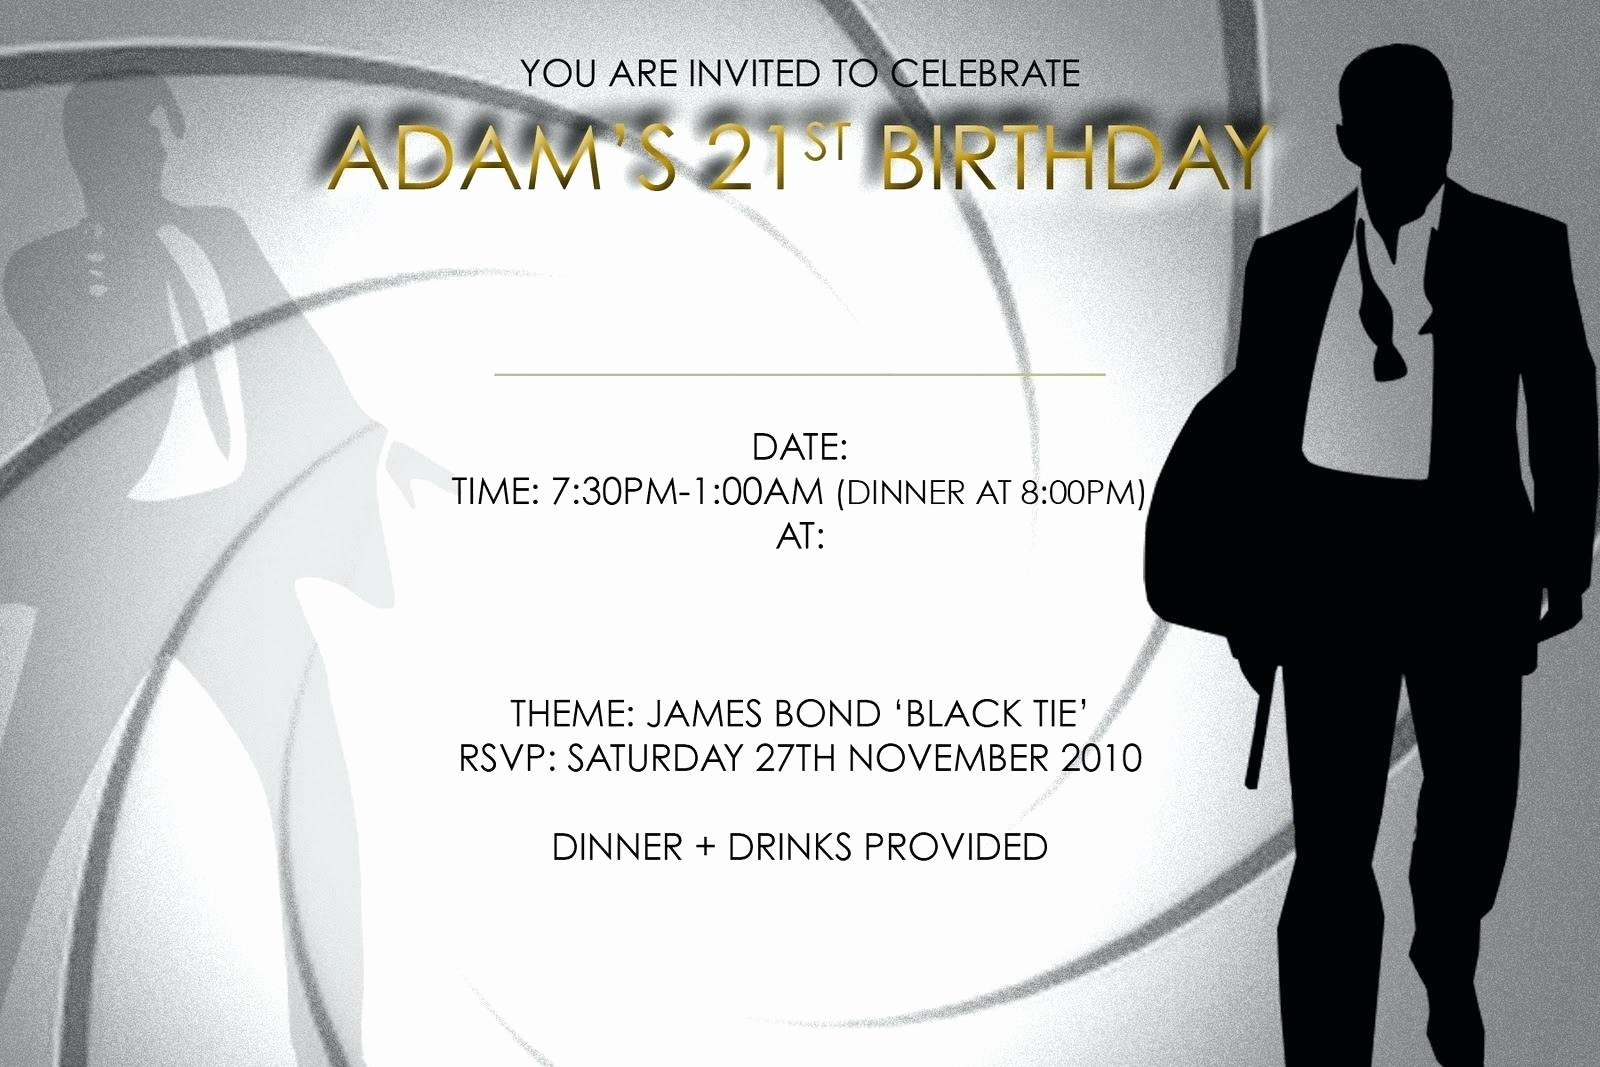 21St Birthday Invitation Templates Free Printable Then Template 21St - 21St Birthday Invitation Templates Free Printable